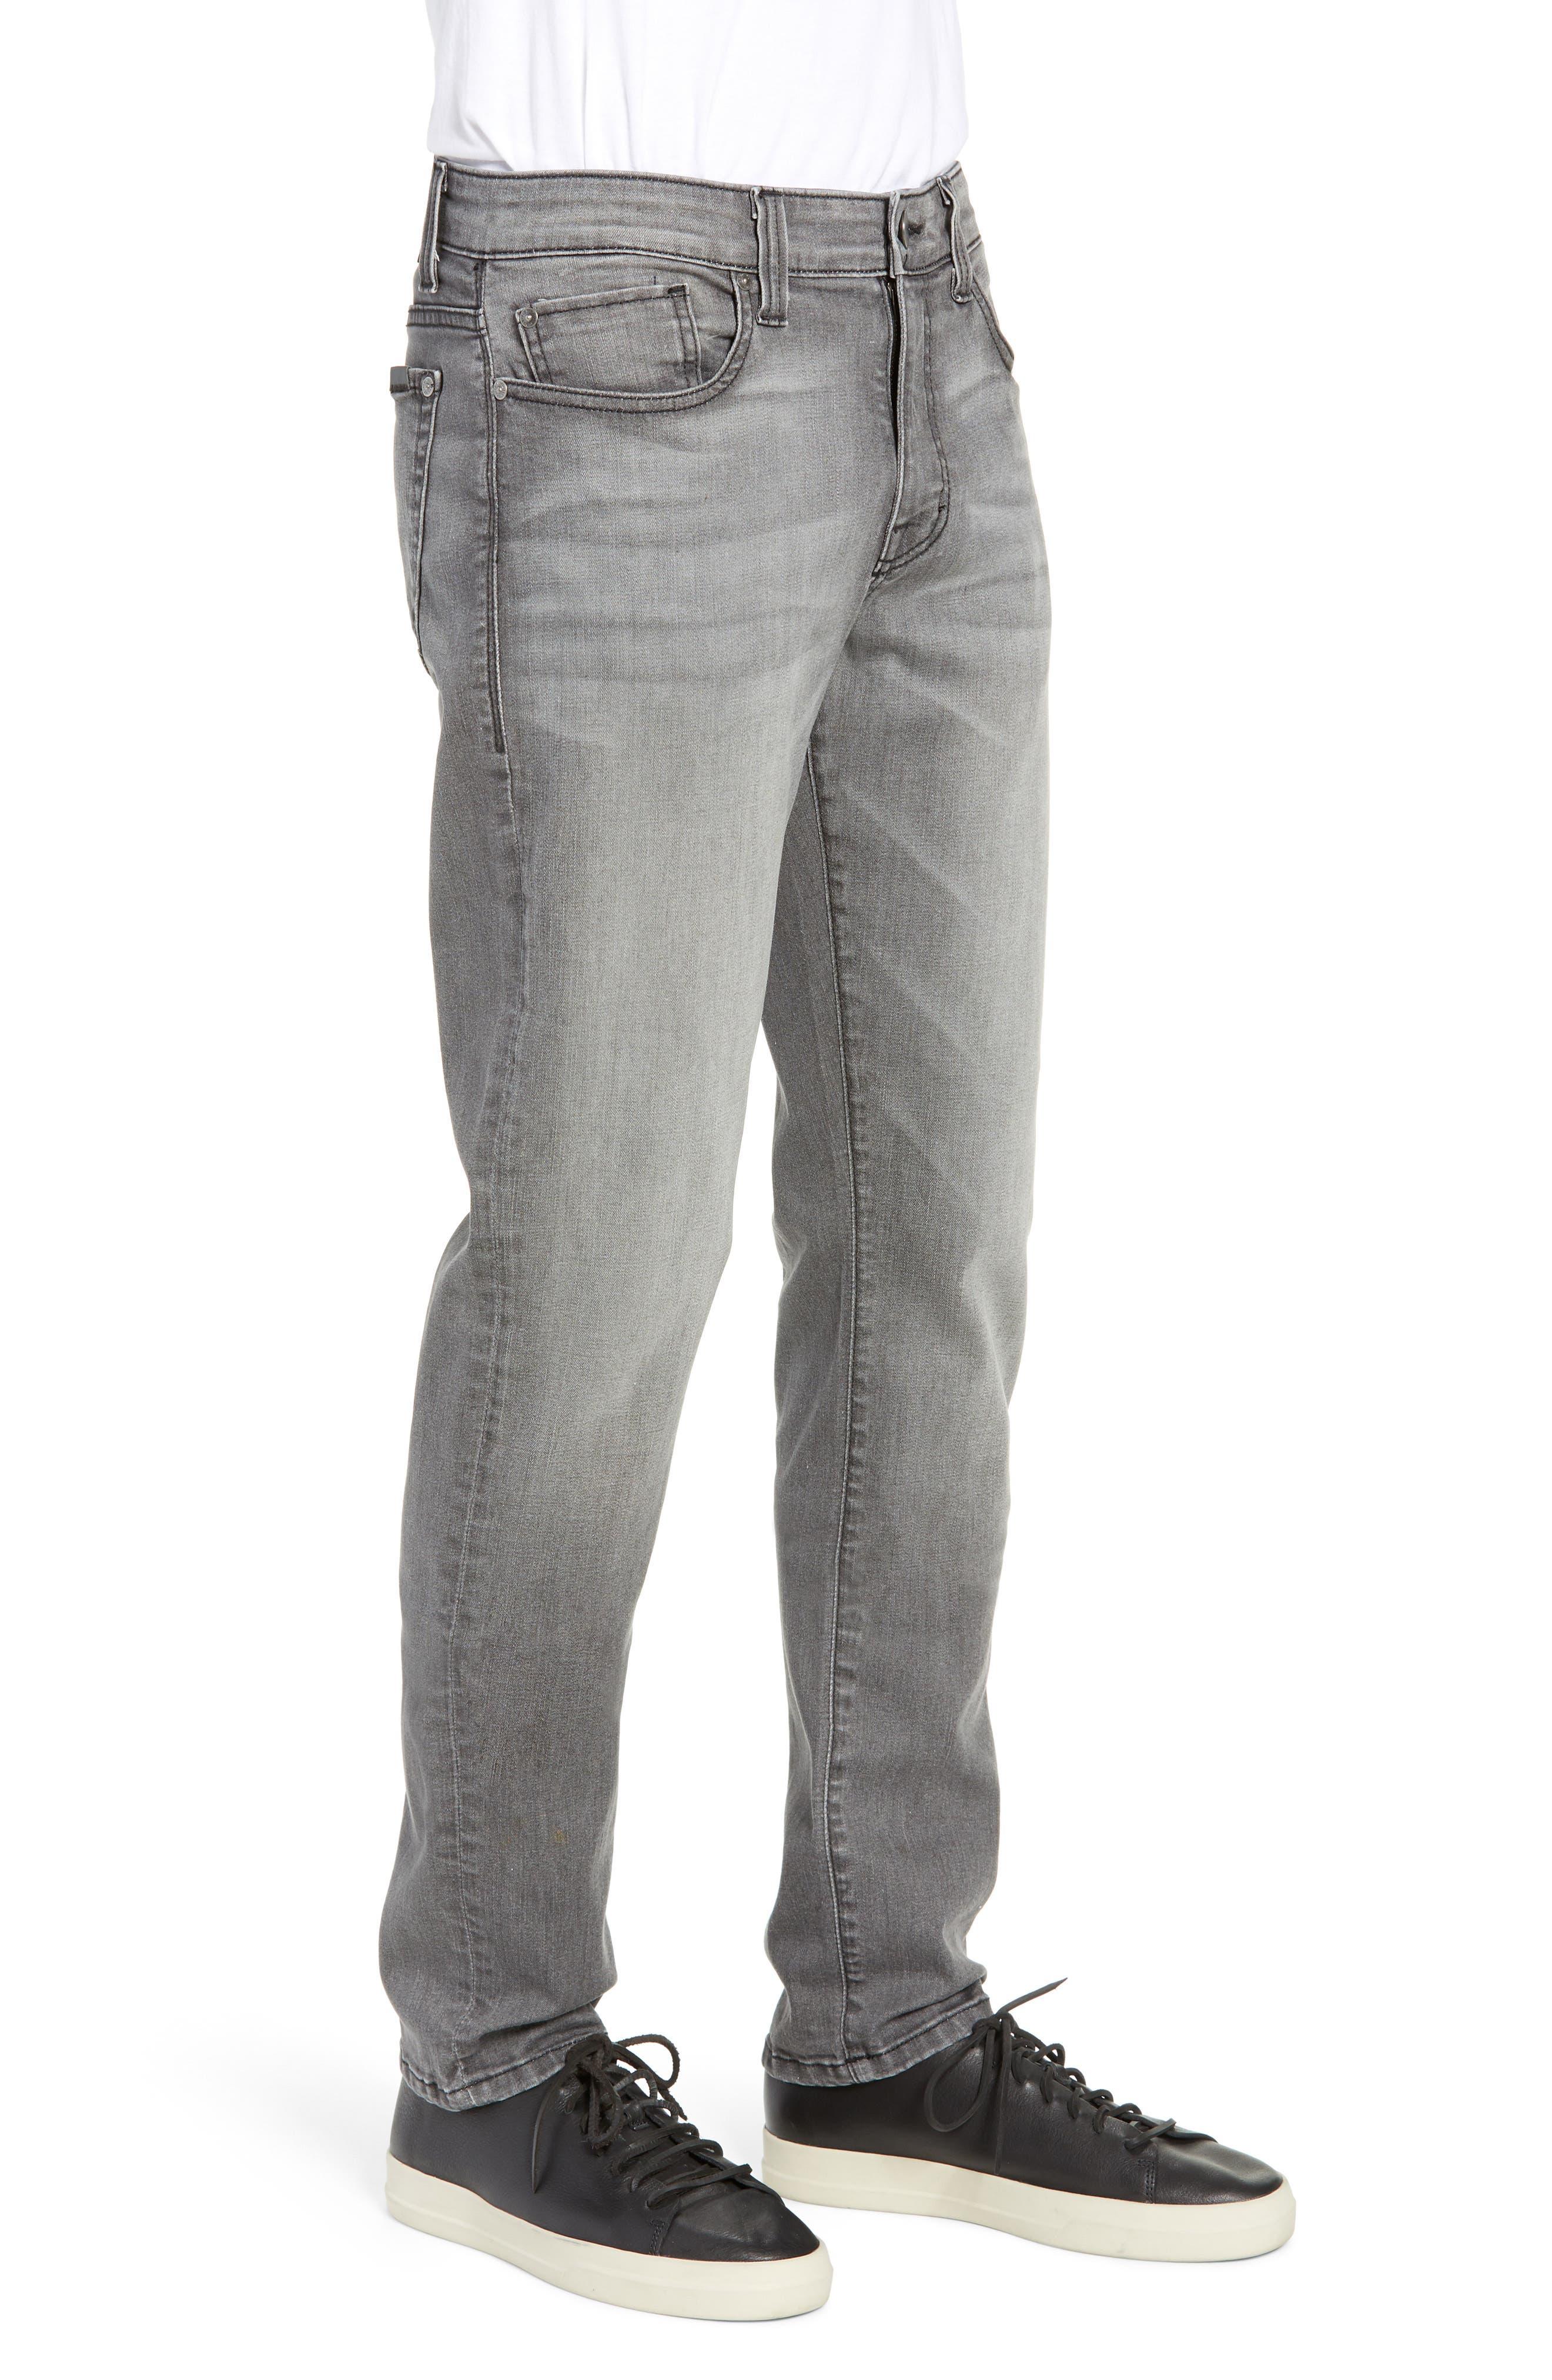 Torino Slim Fit Jeans,                             Alternate thumbnail 3, color,                             PHANTOM GREY